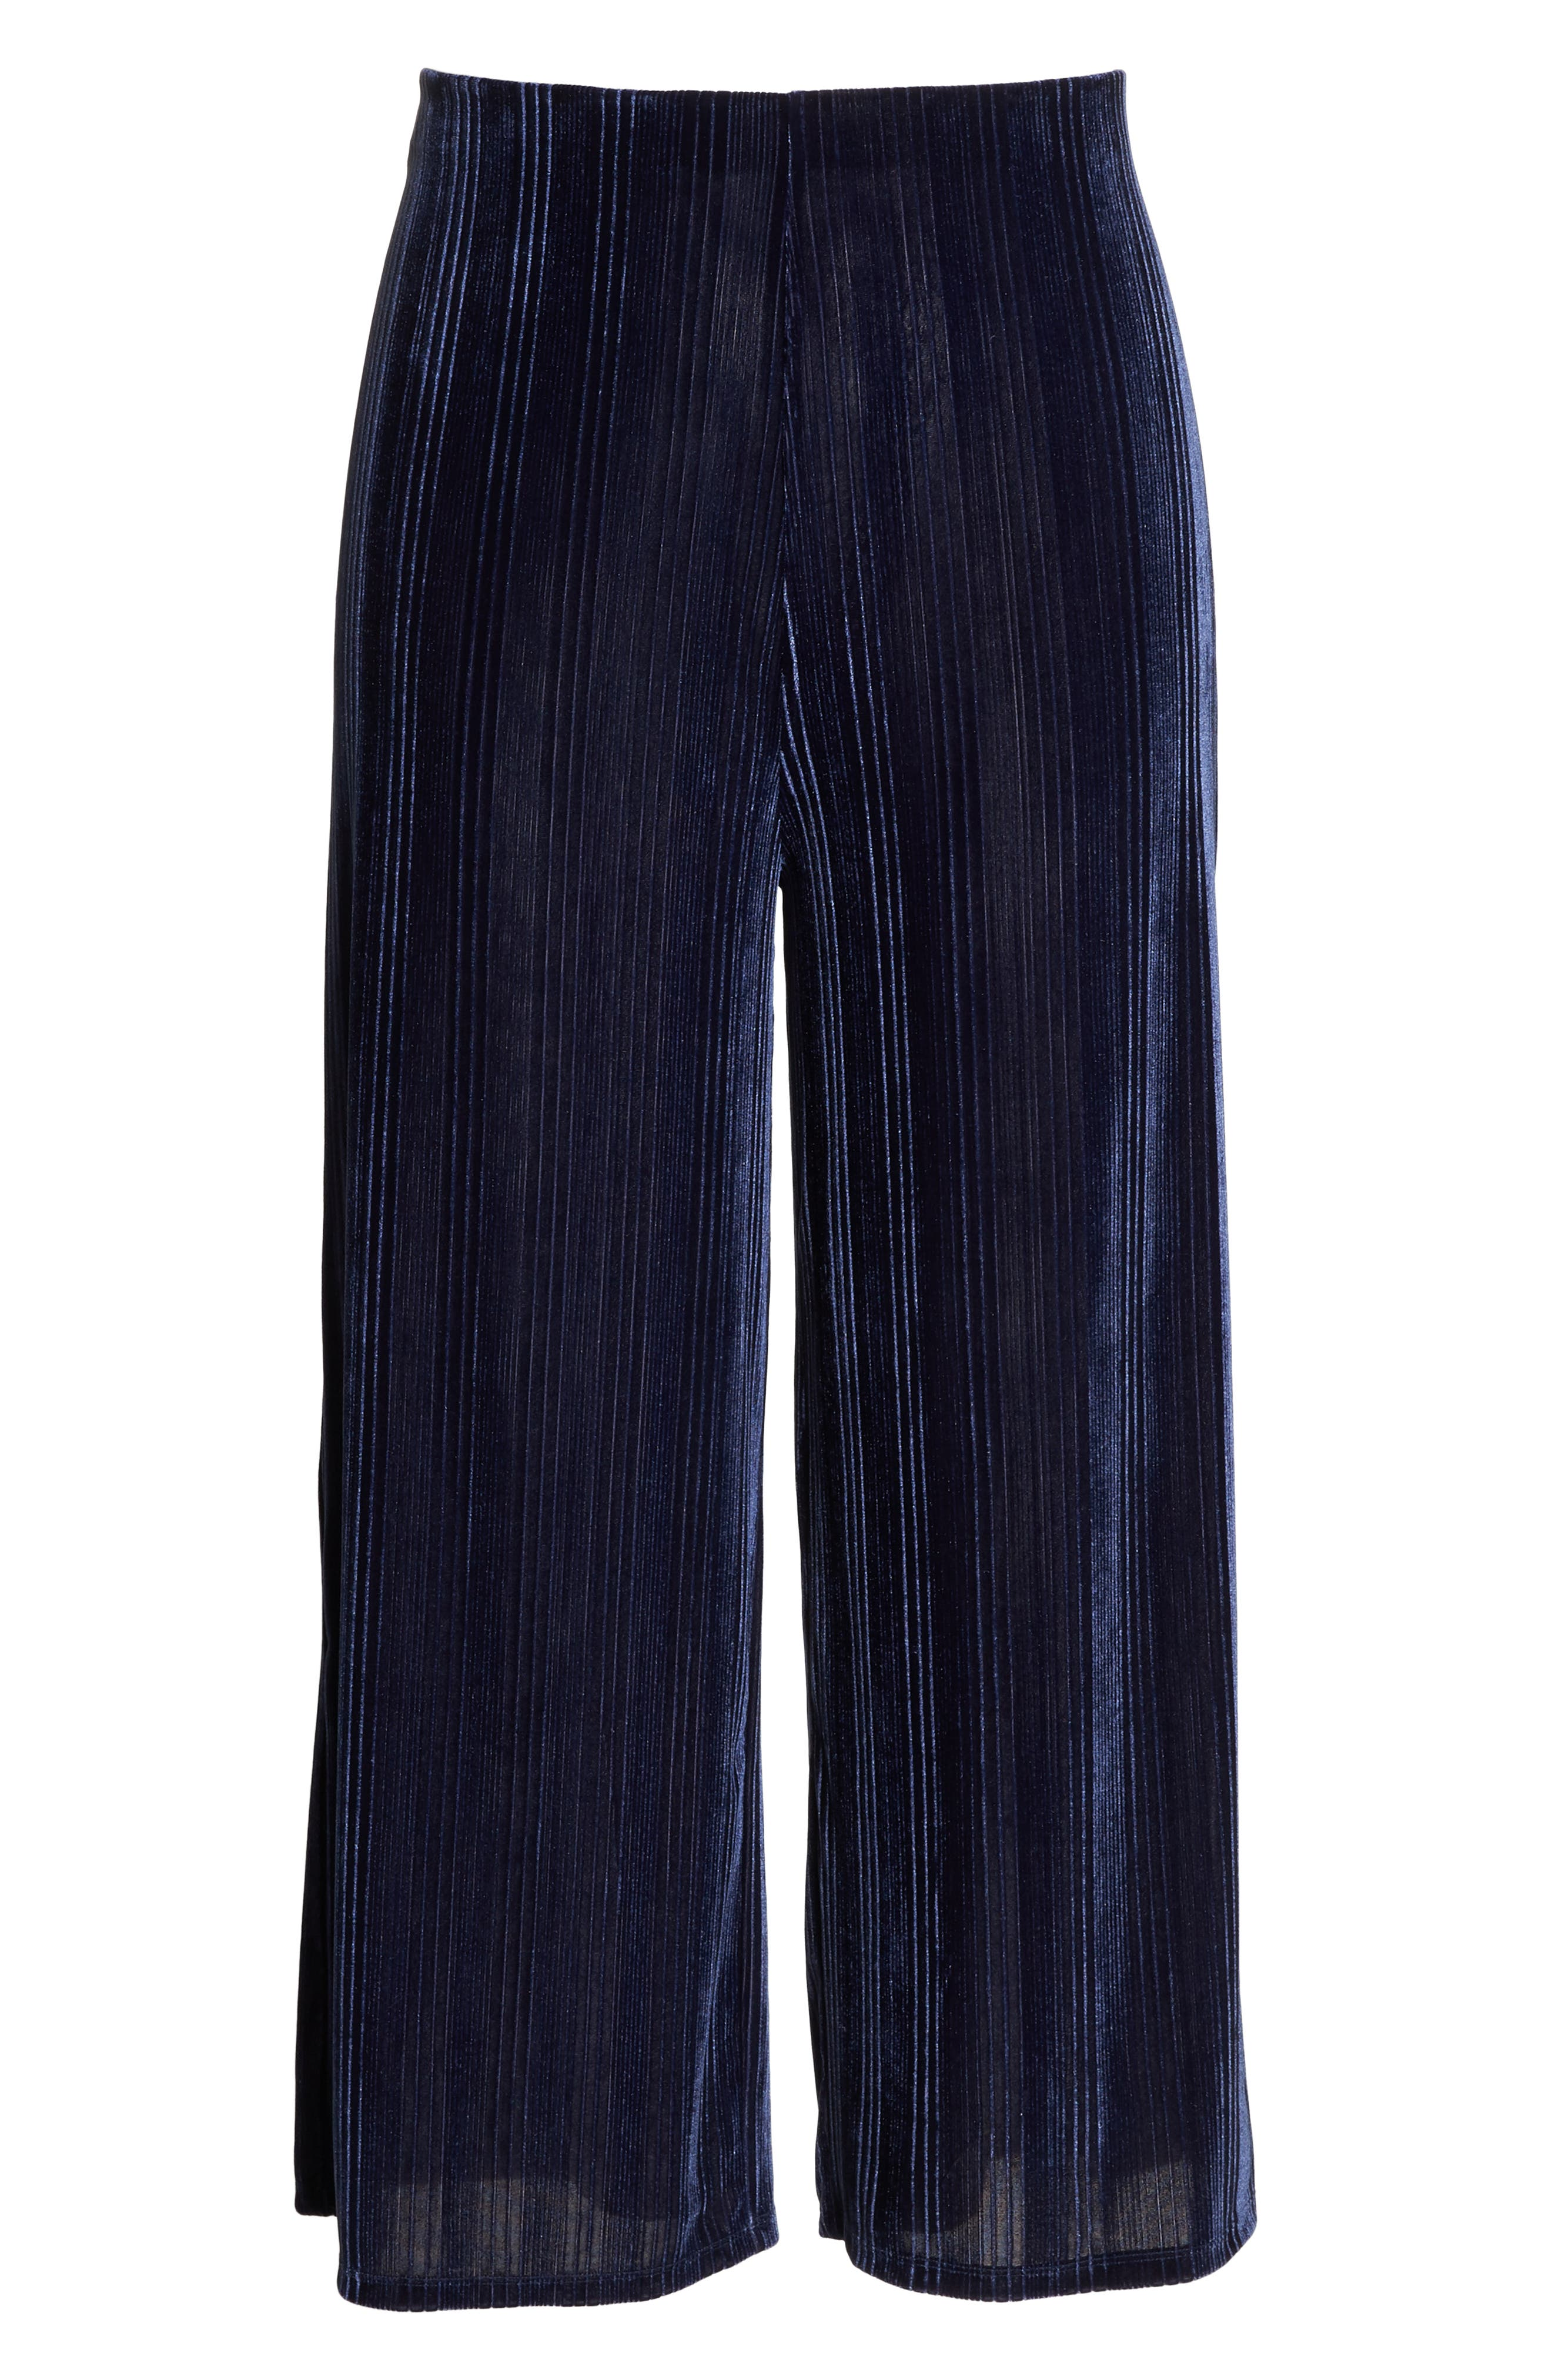 High Rise Velour Wide Leg Crop Pants,                             Alternate thumbnail 7, color,                             NAVY MARITIME